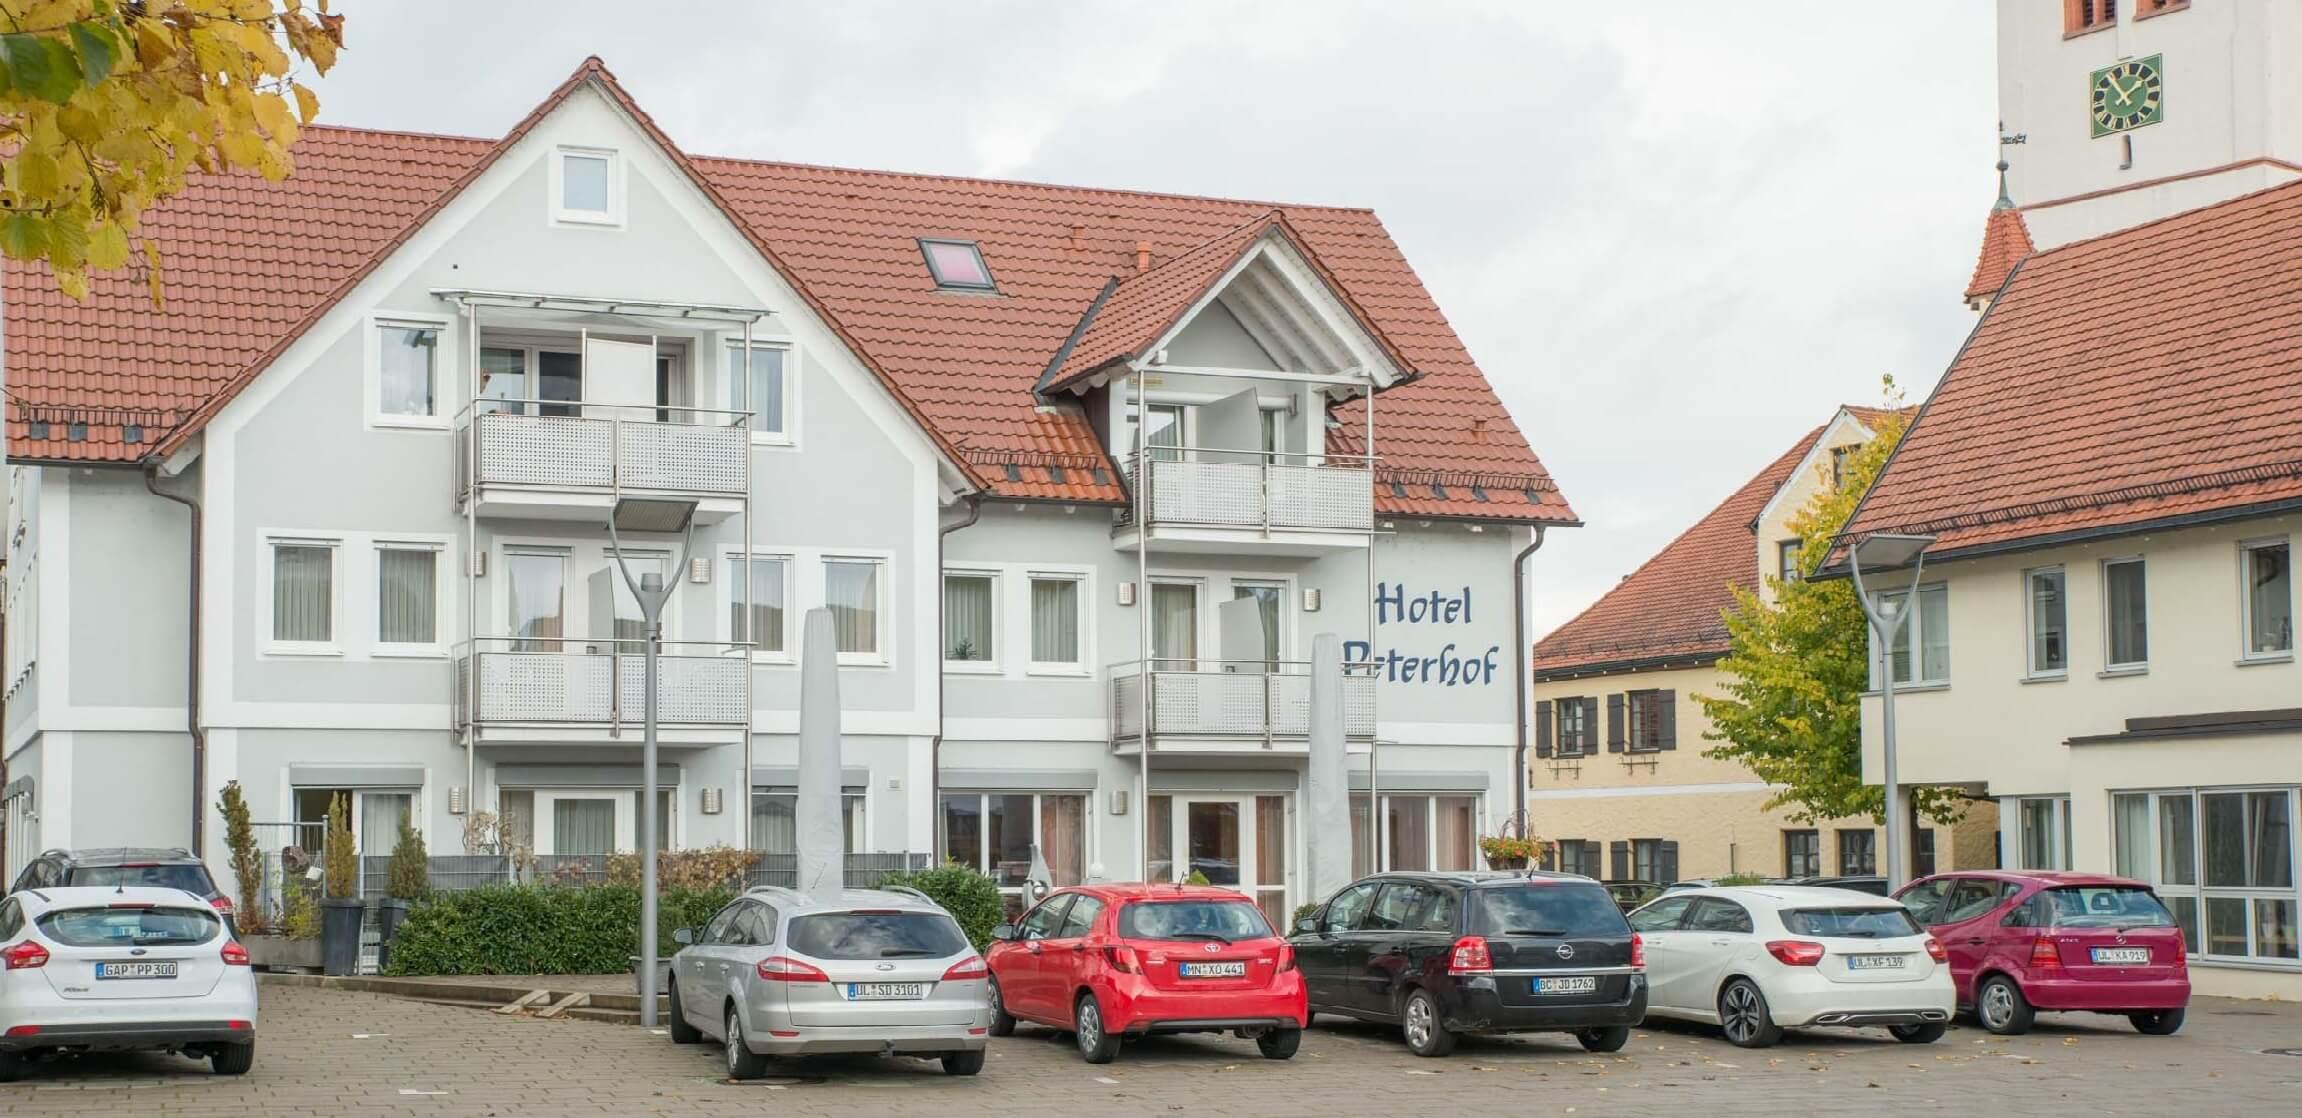 Hotel Garni Peterhof